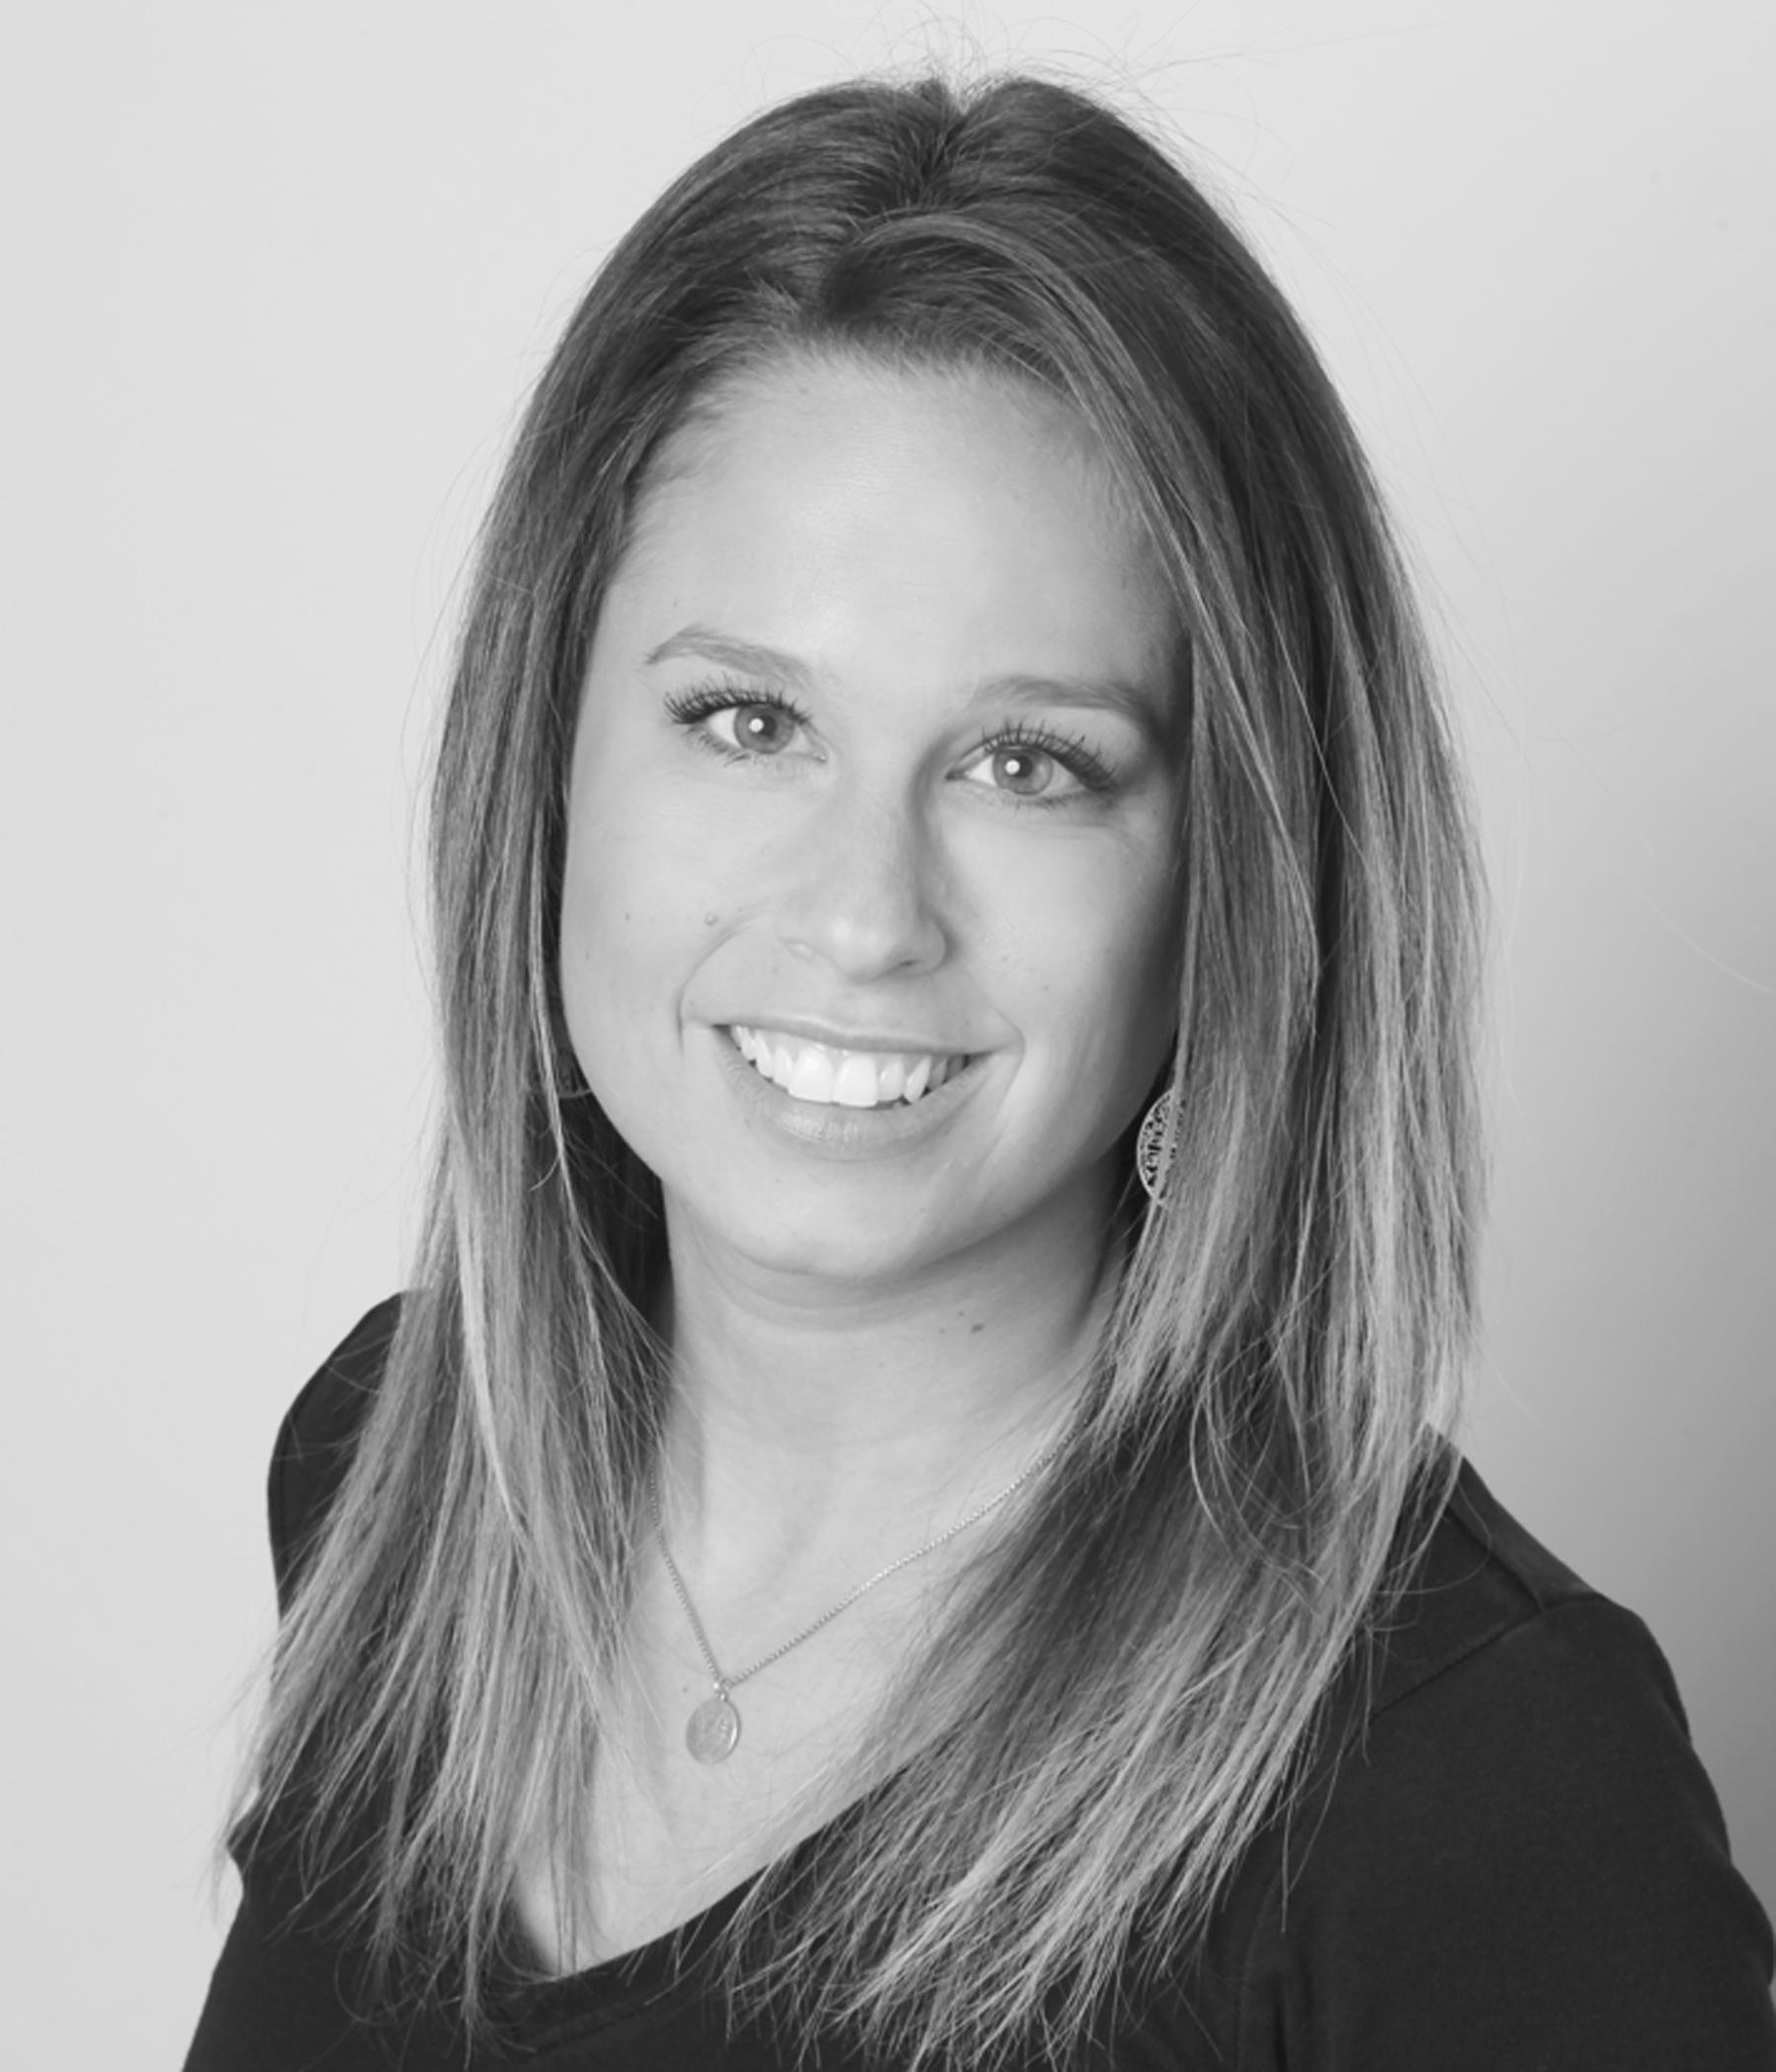 Marisa Balmer